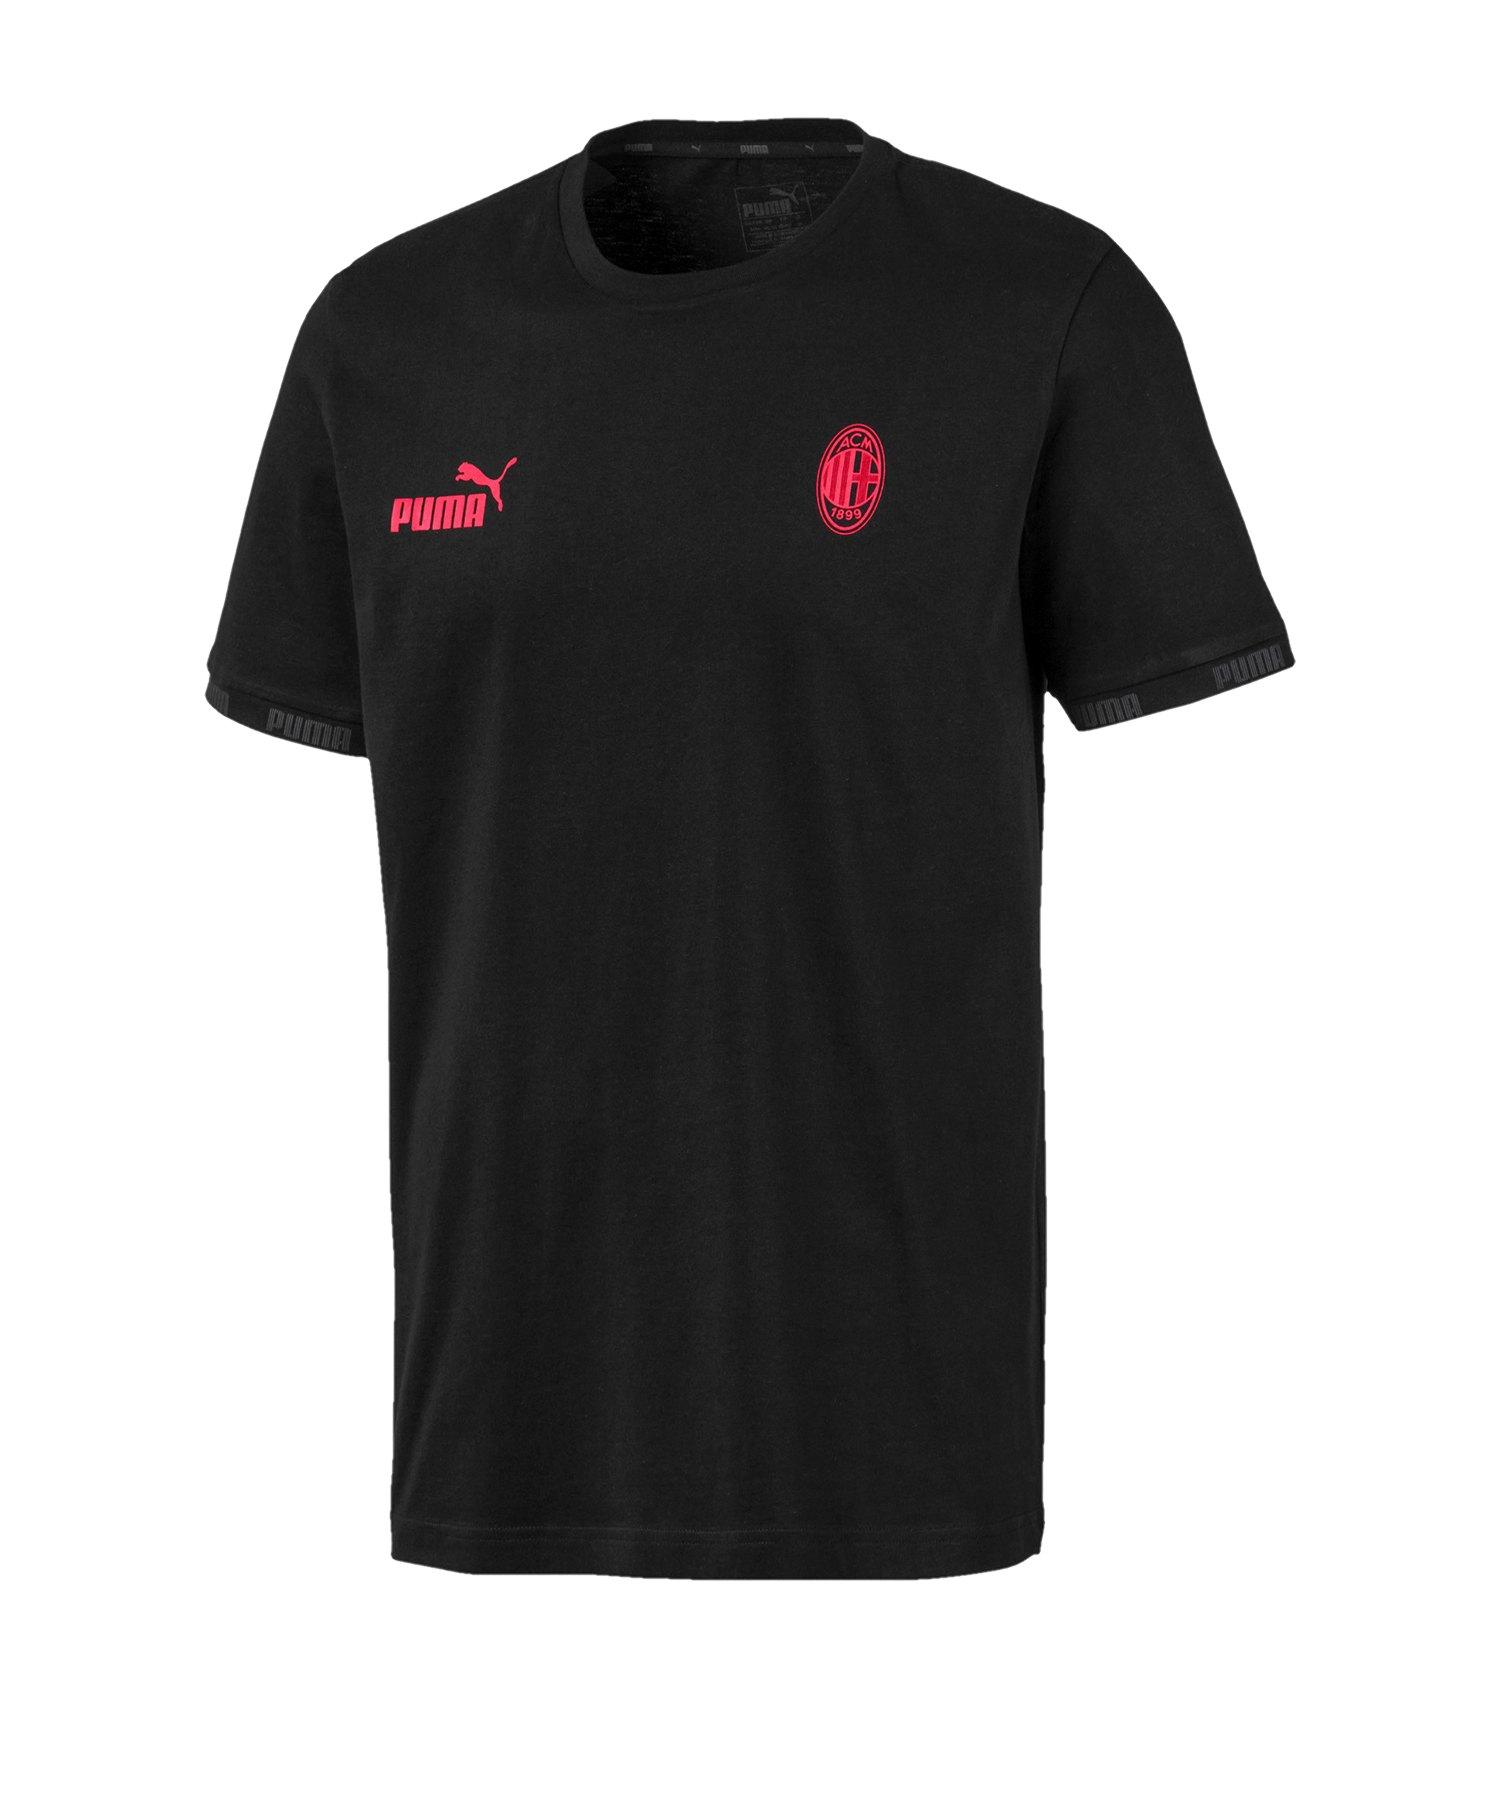 PUMA AC Mailand FtblCulture T-Shirt Schwarz F03 - Schwarz